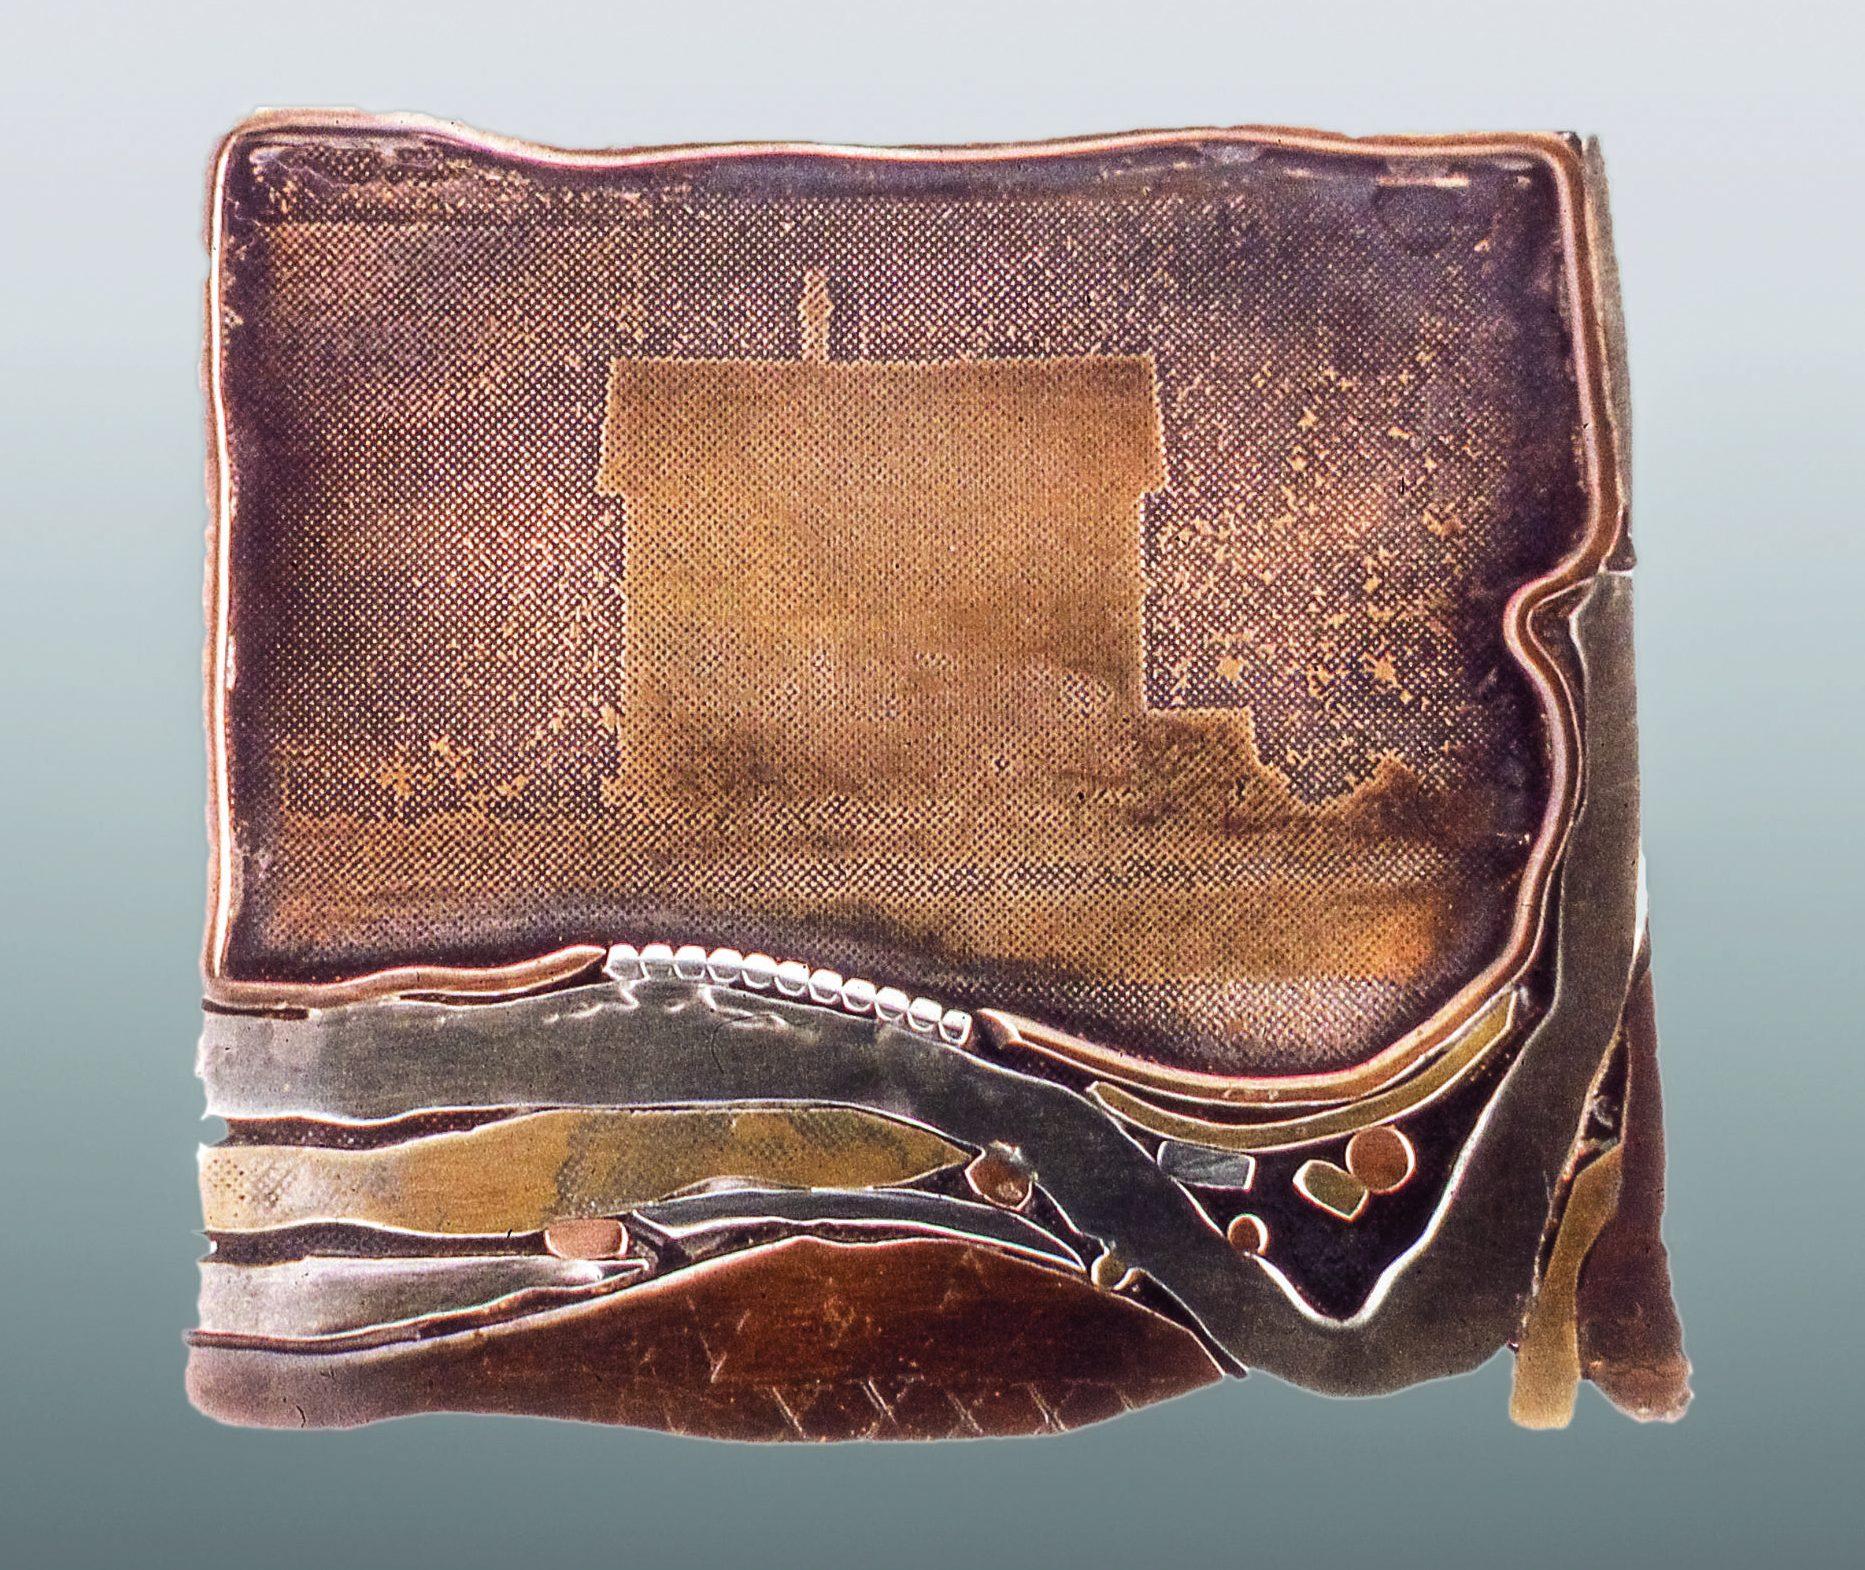 Eleanor H. Moty, Prairie House Pin, broche, 1969. Foto Eleanor H. Moty, brons, zilver, koper,